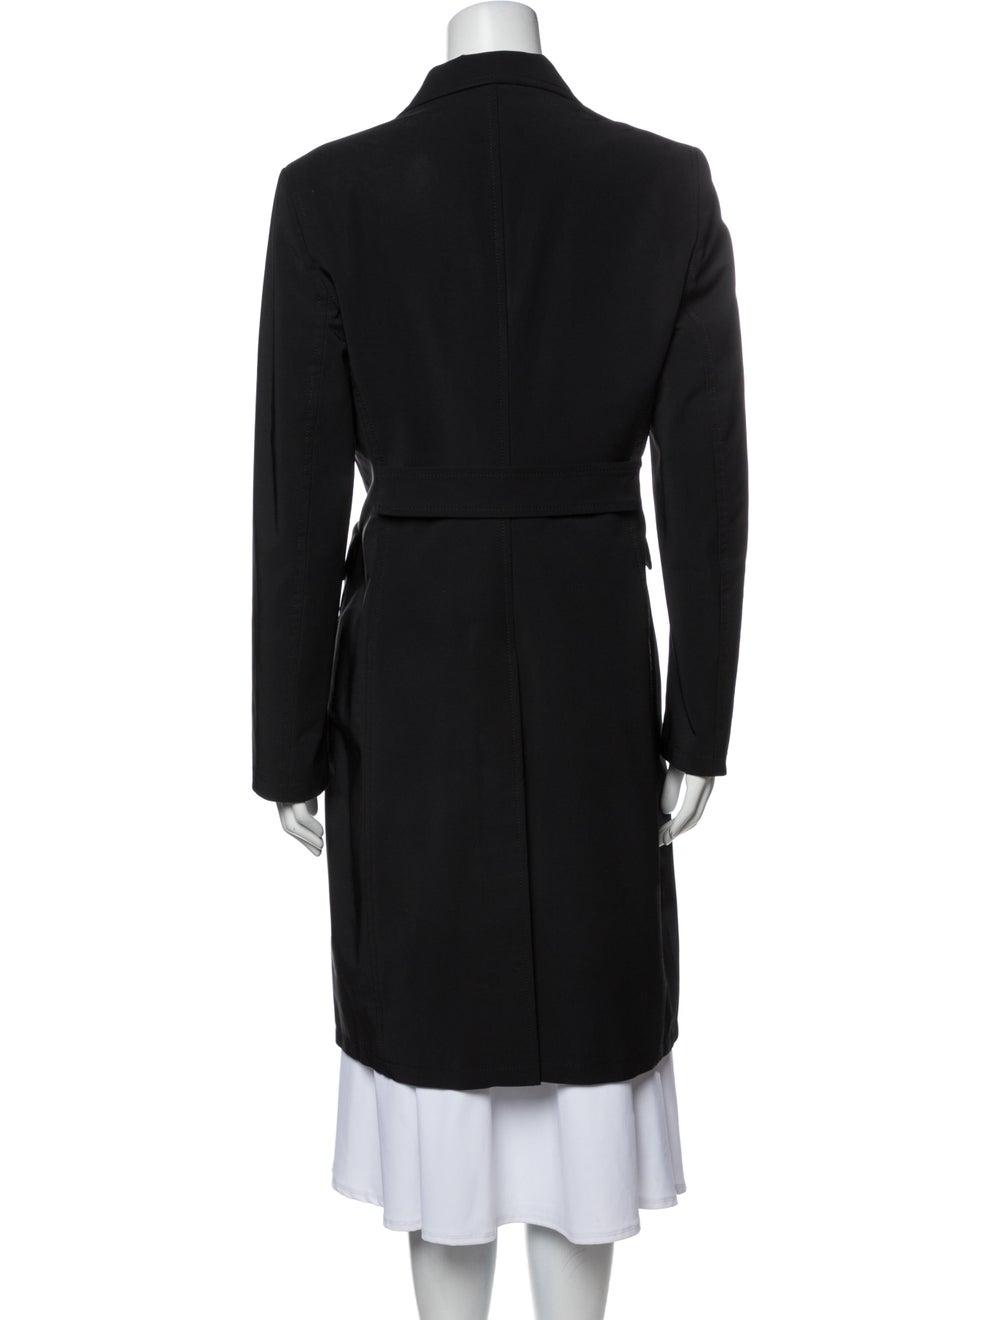 Prada Vintage 1990's Coat Black - image 3